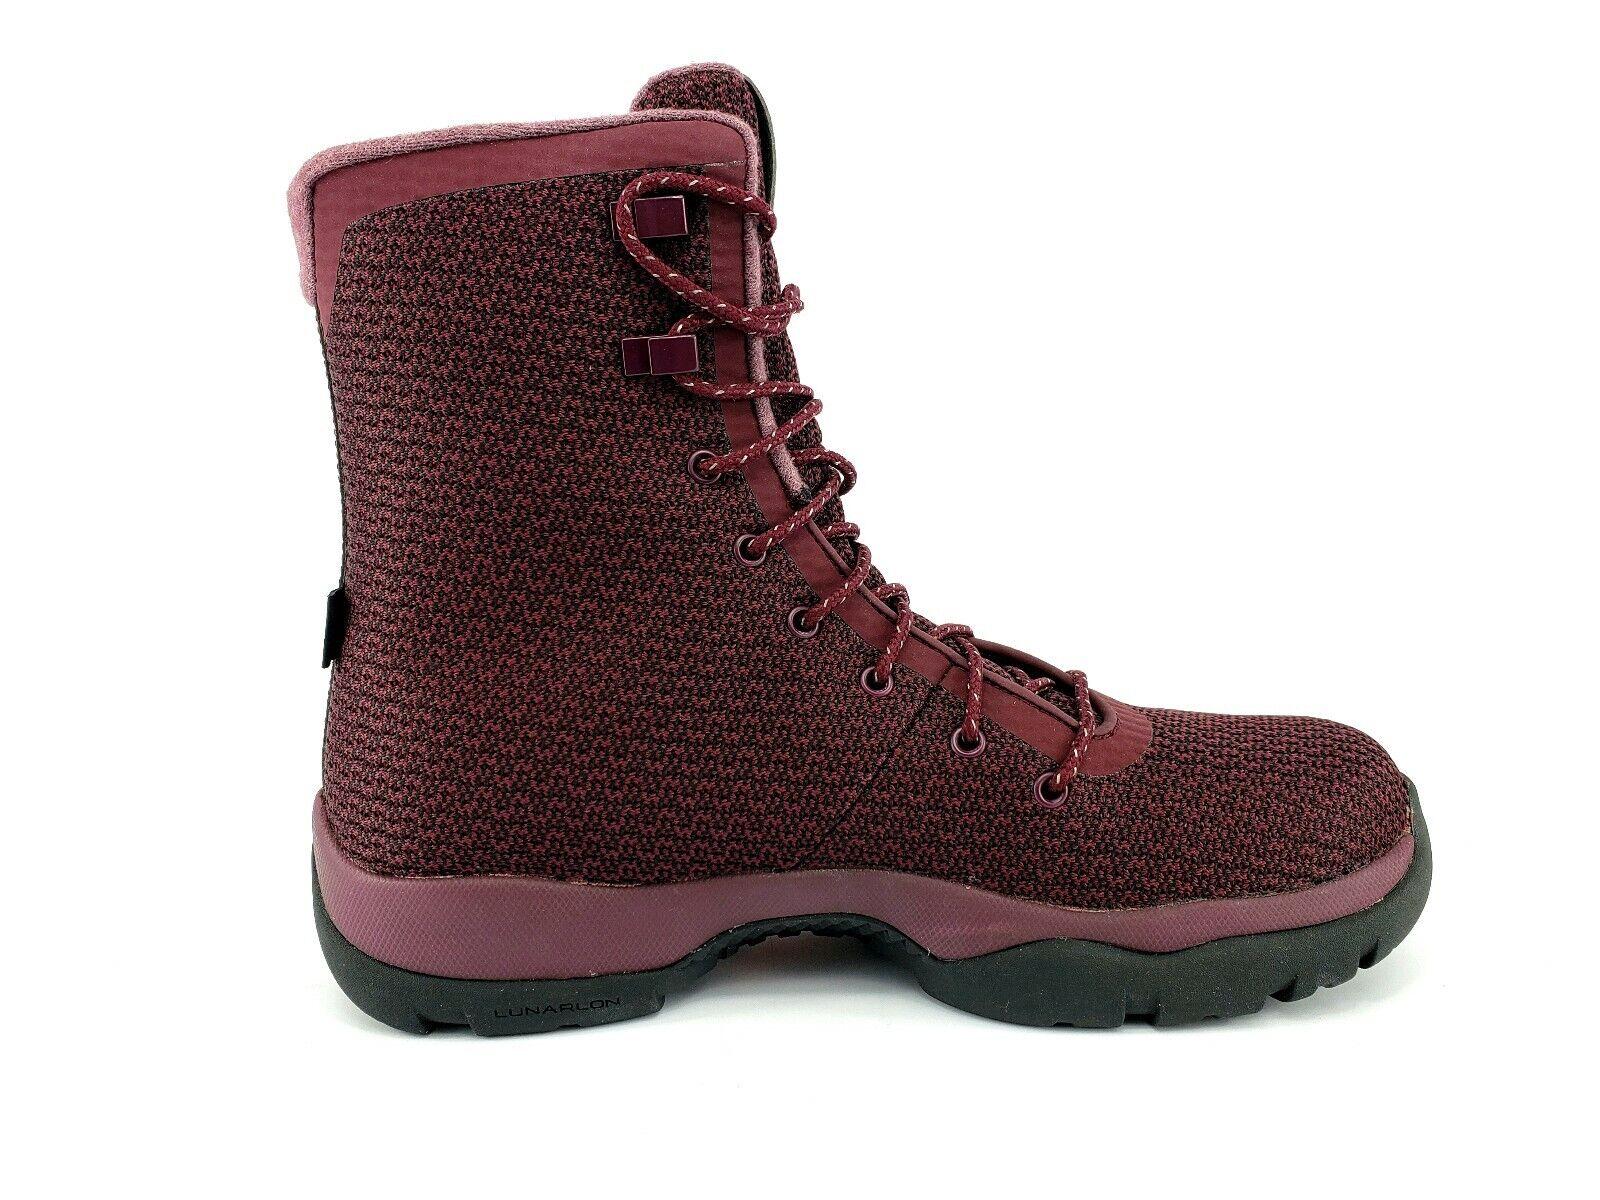 Nike Air Jordan Future Boot Night Maroon Burgundy Red Black SZ10.5 (854554-600)